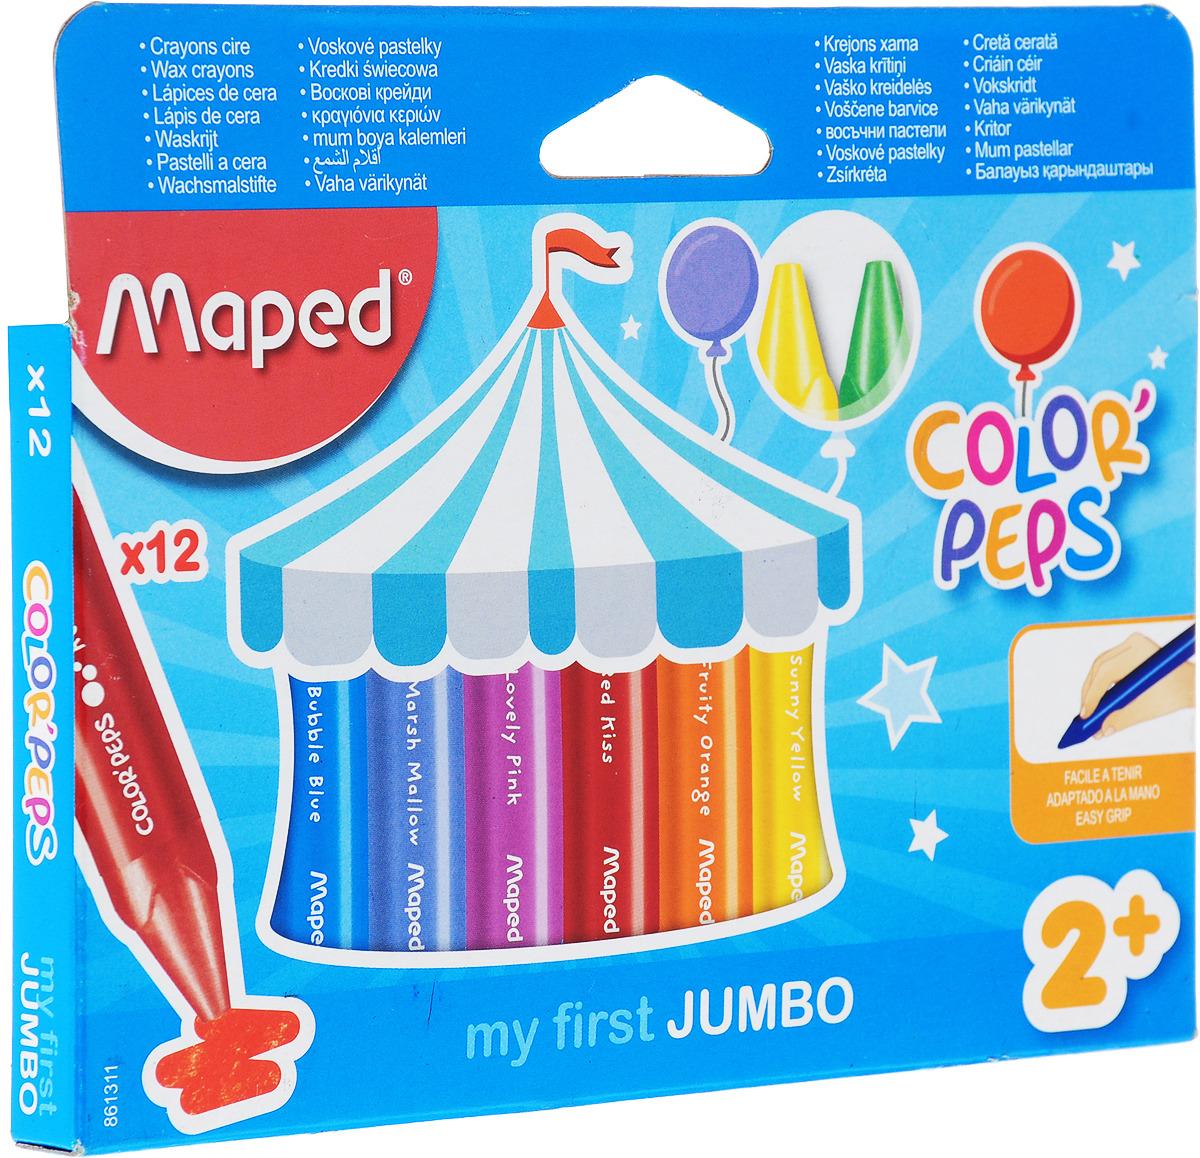 Maped Восковые мелки Color Peps 12 шт карандаши восковые мелки пастель micador гипоаллергенные восковые мелки выкручивающиеся 24 шт